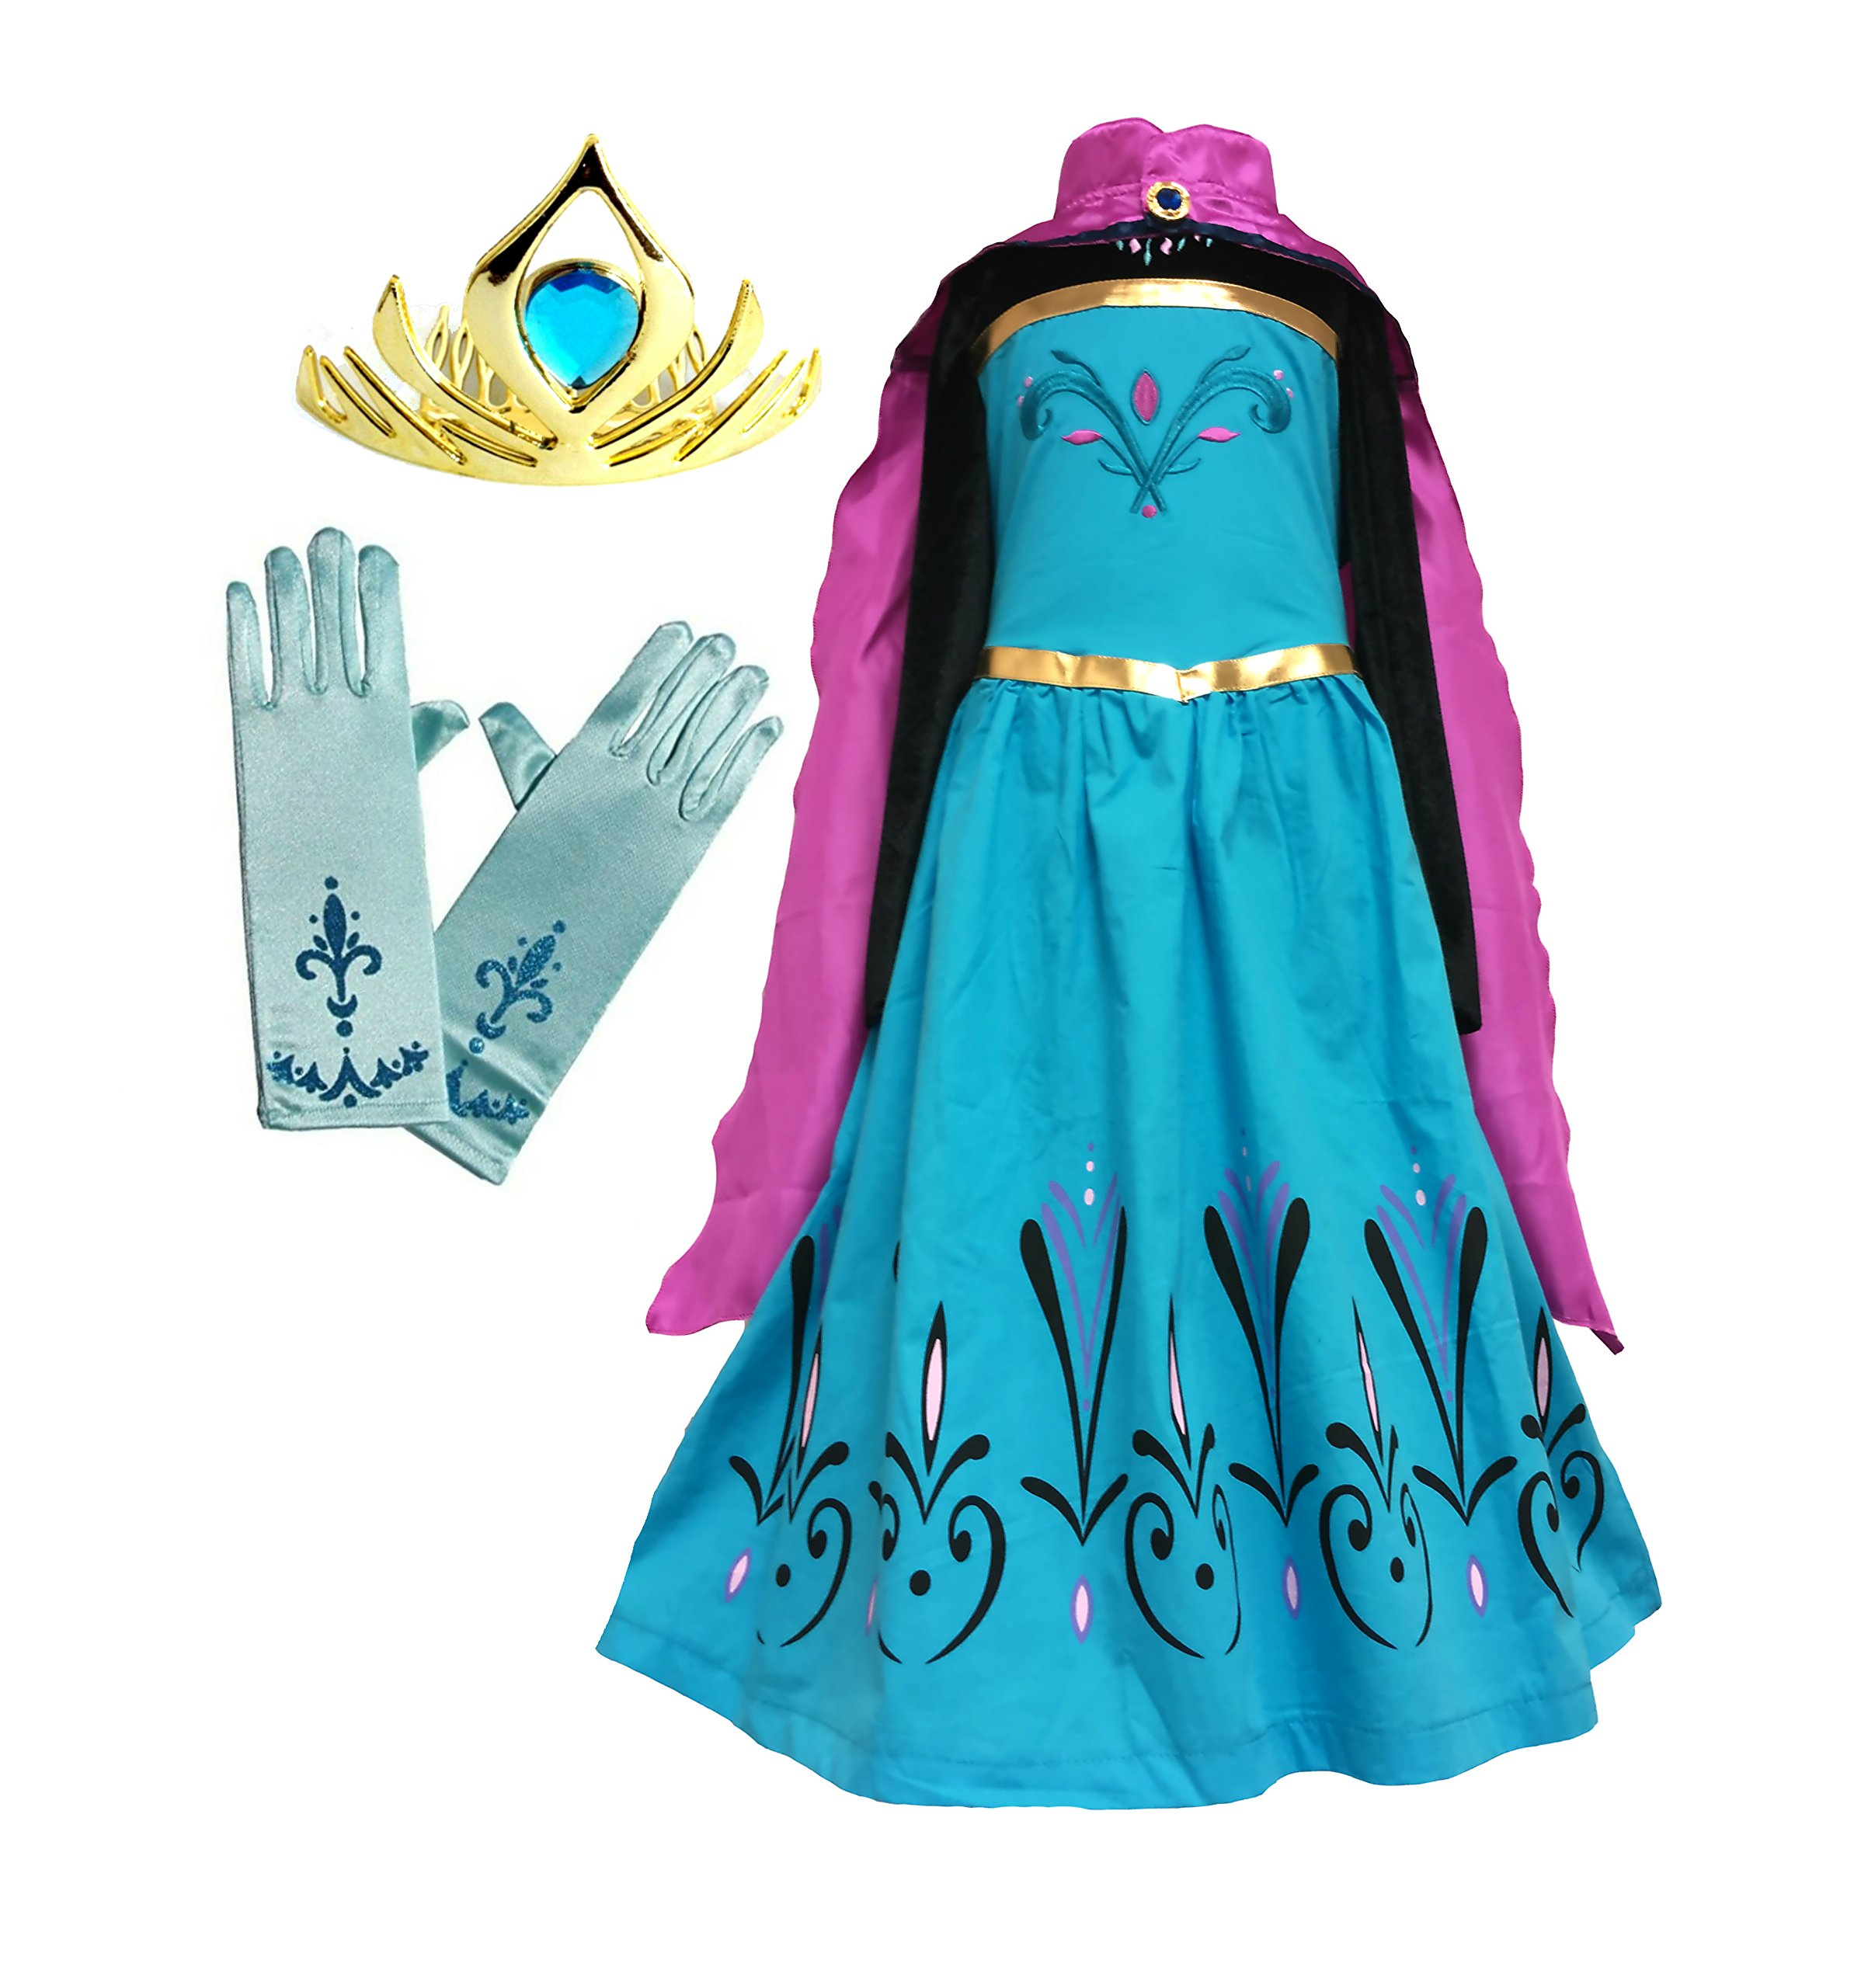 American Vogue Elsa Coronation Dress Costume + Cape + Gloves + Tiara Crown (7 Years, Blue)